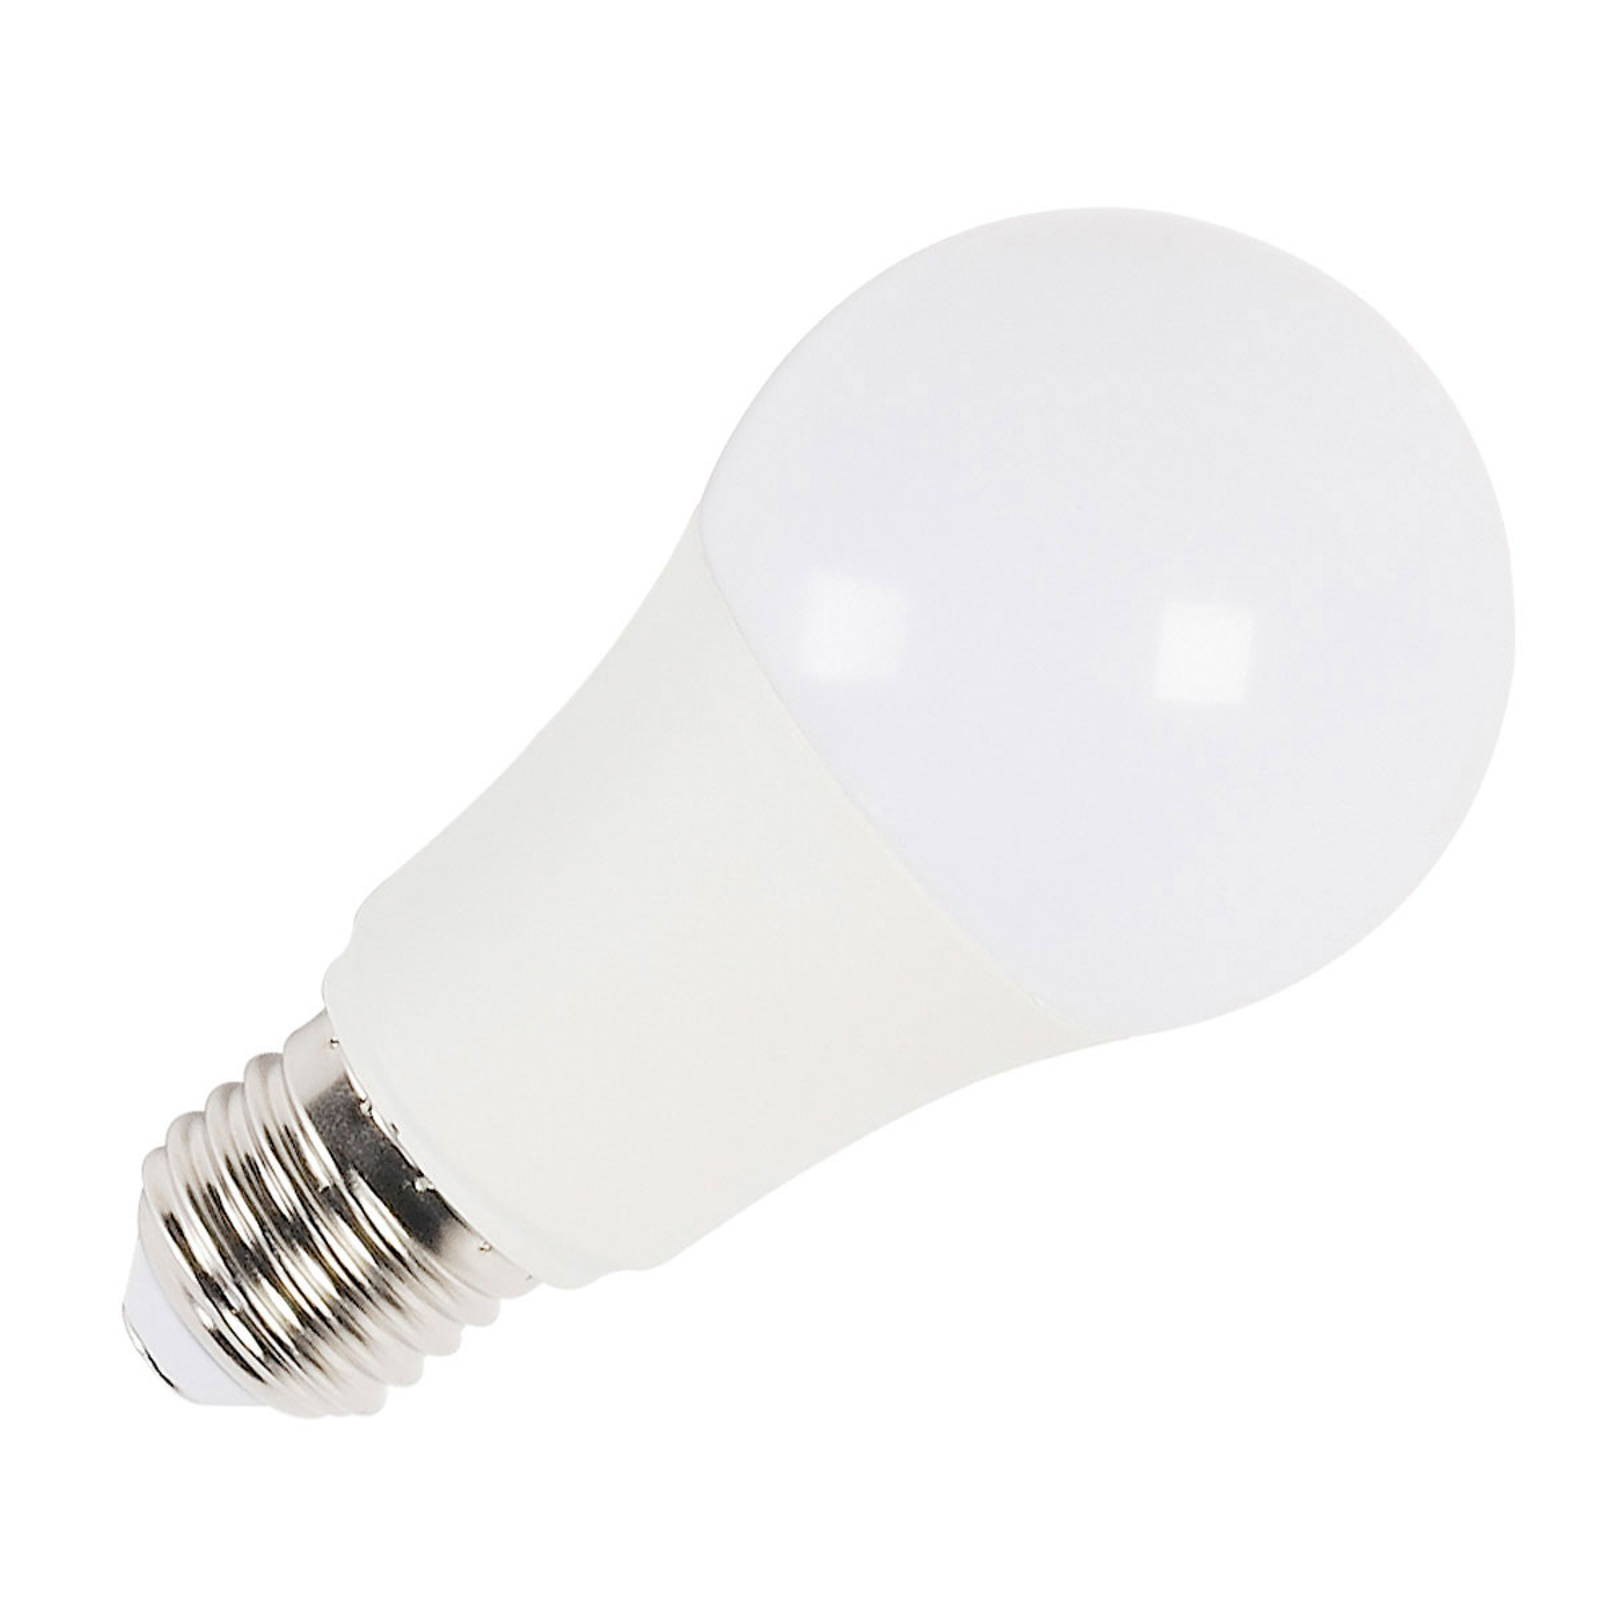 SLV VALETO LED-Lampe E27 A60 9,5W RGBW 806lm